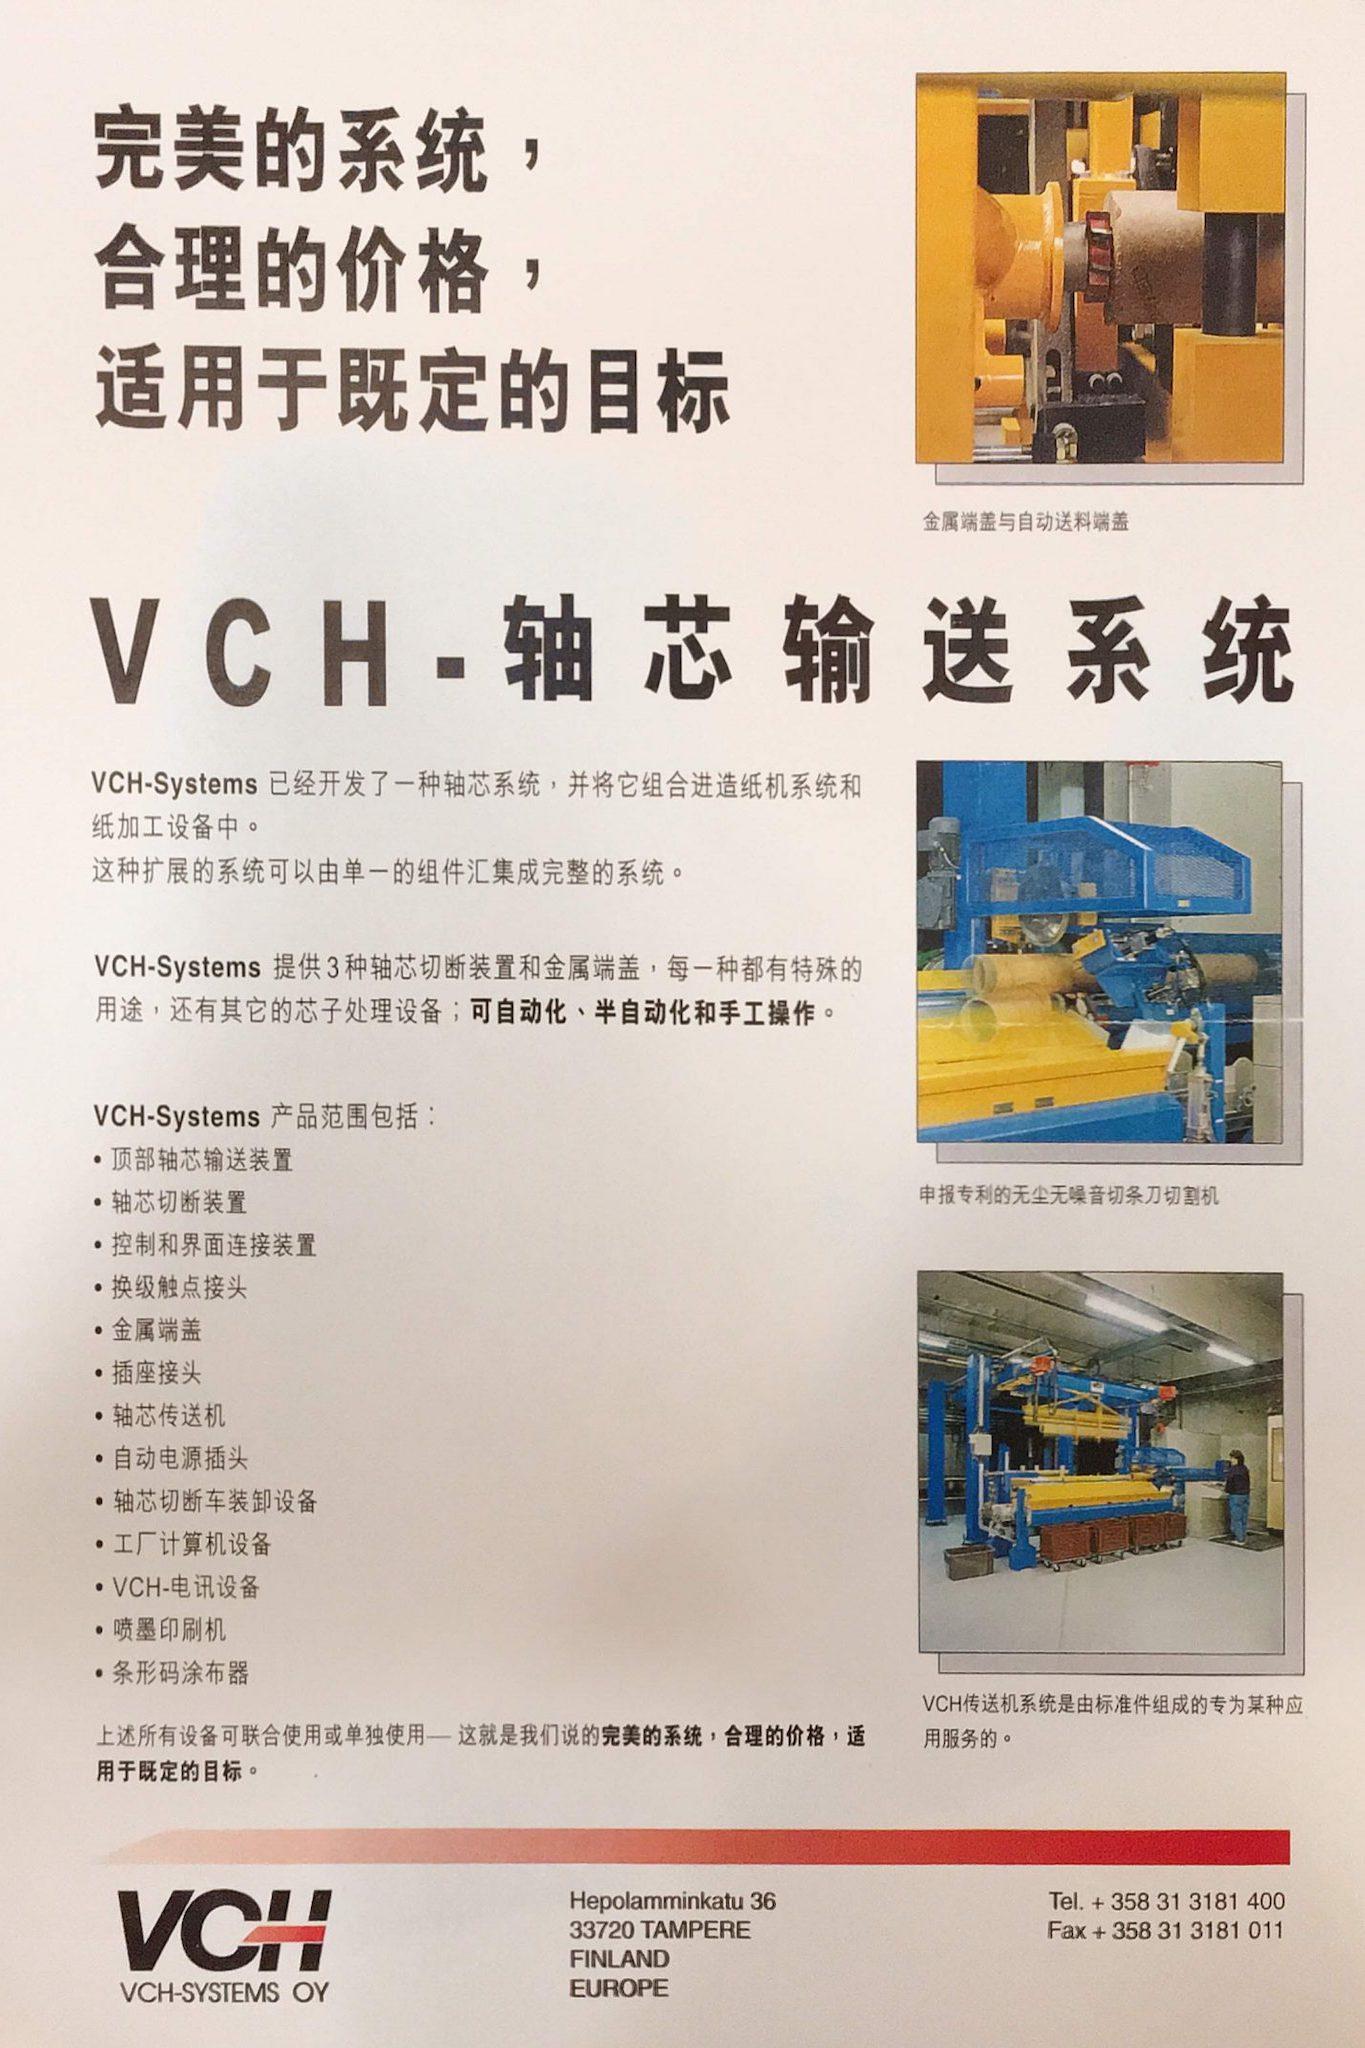 tekway-company-leaflets-brochures-vch-e1585129833888-1428x2048